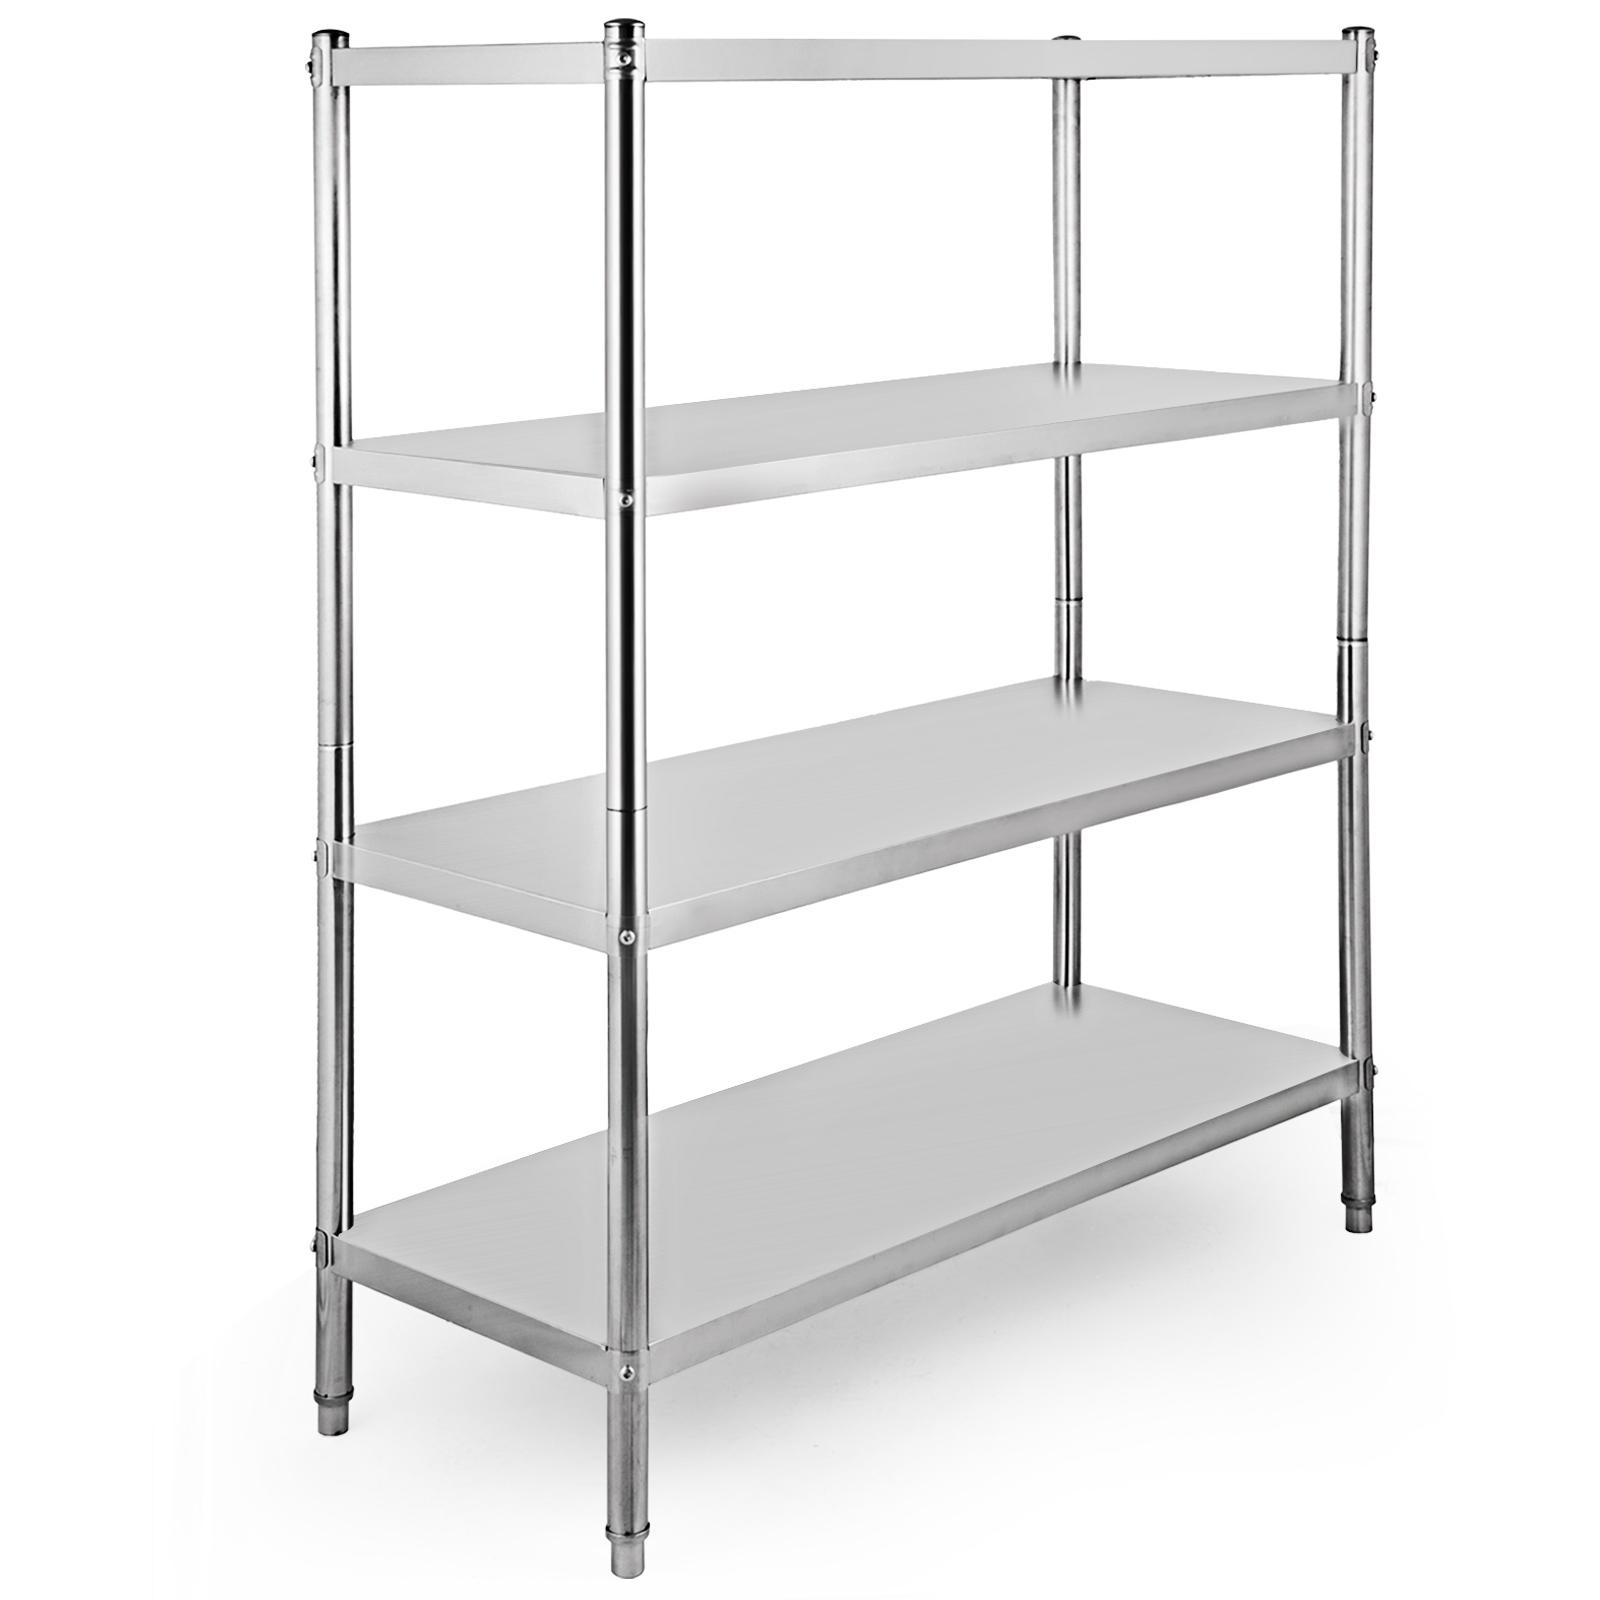 Details About 4 Level Adjustable Heavy Duty Shelves Unit Garage Shelf Steel Metal Storage Rack